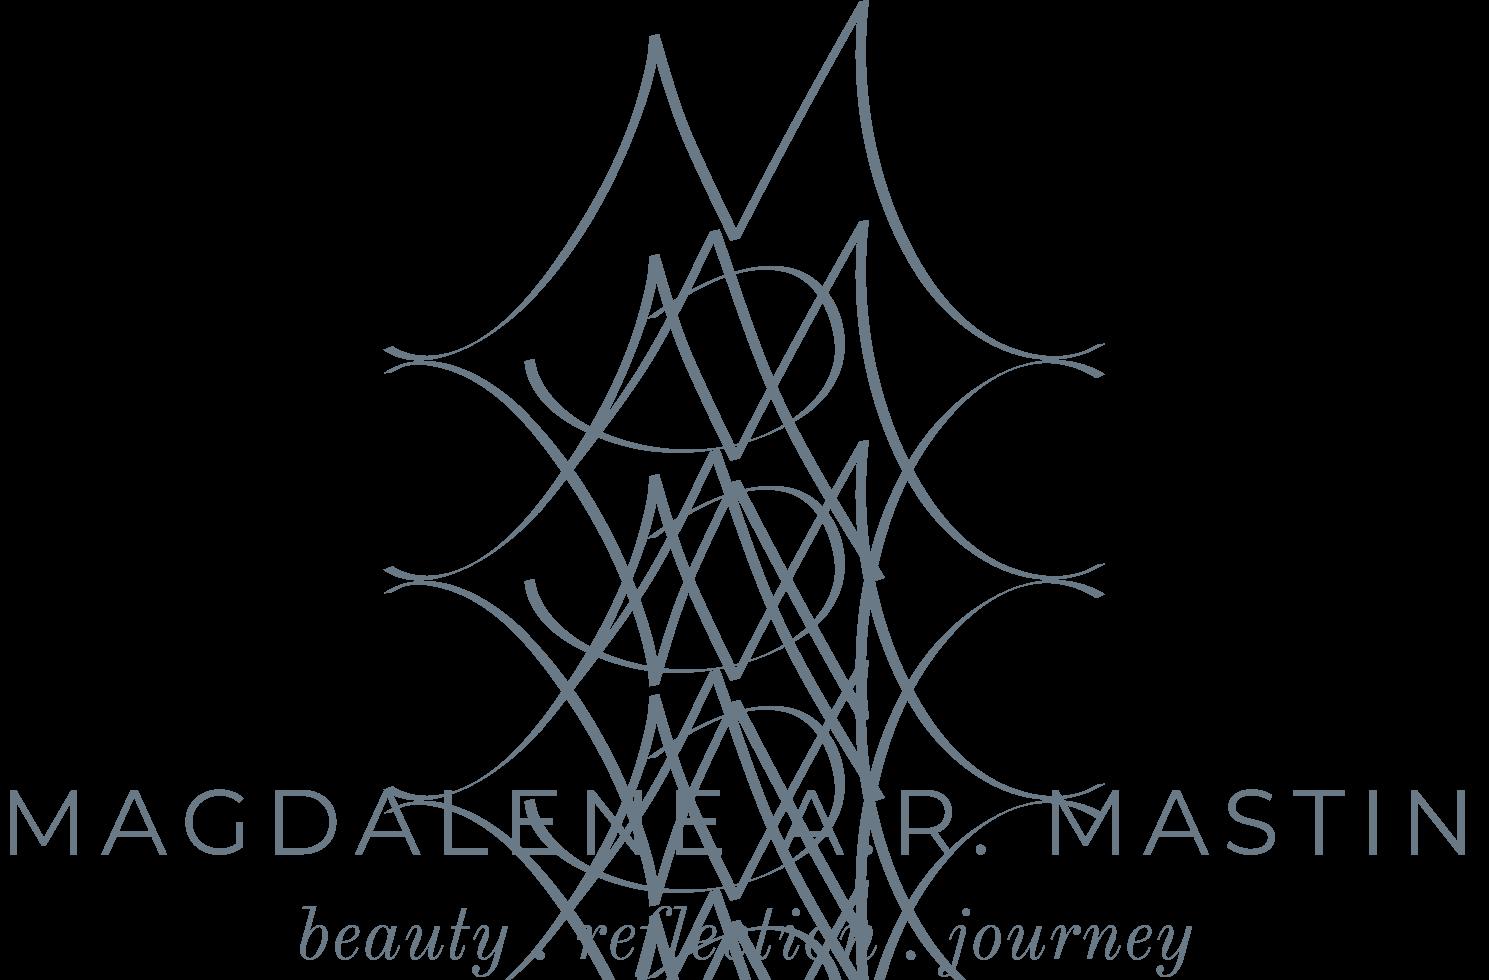 Magdalene A.R. Mastin